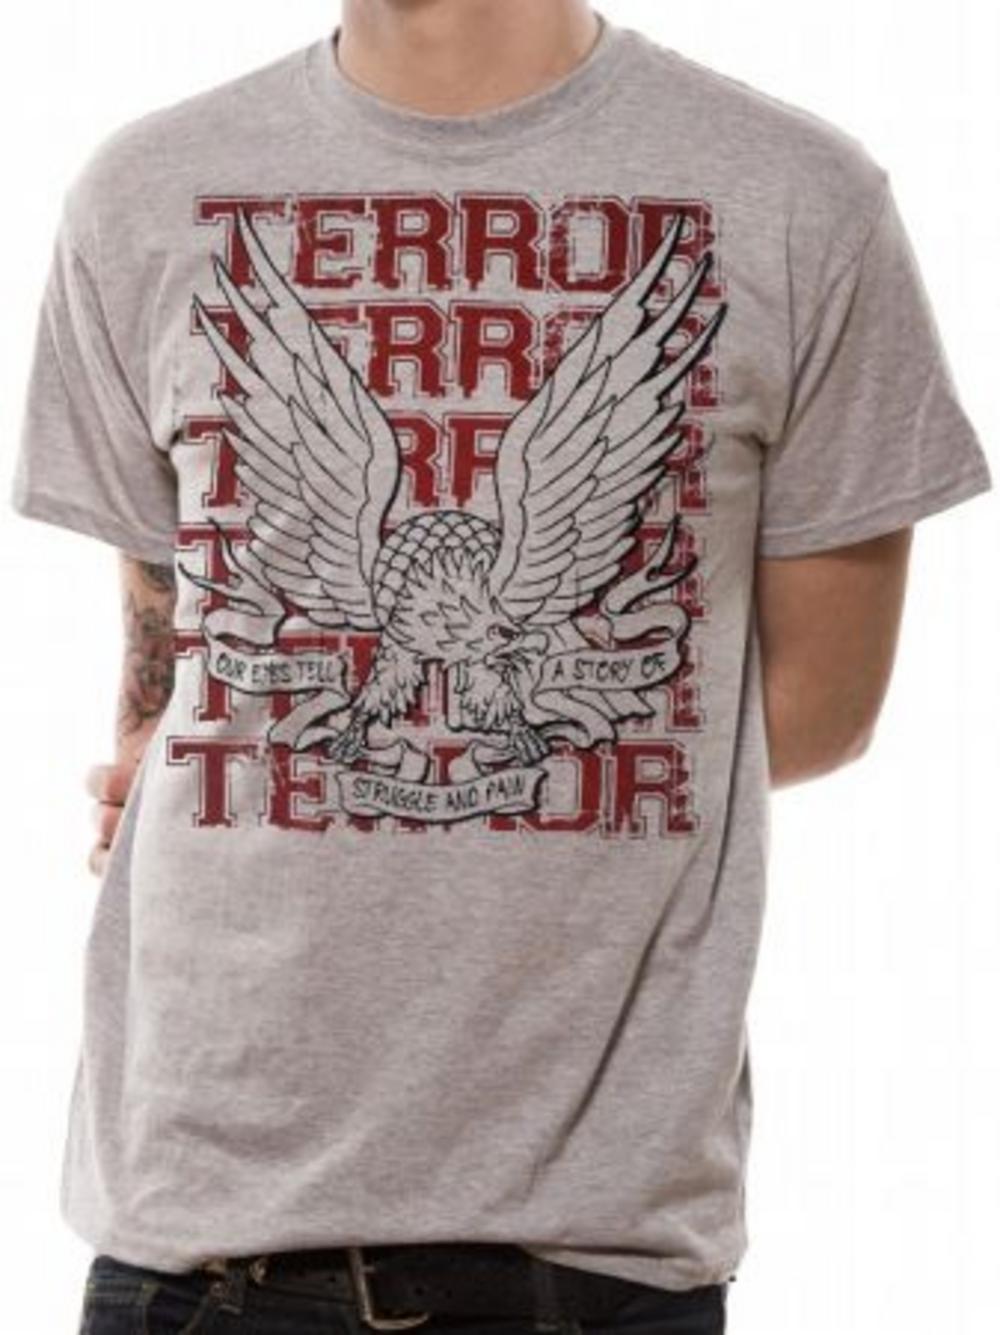 Terror (Struggle and Pain) T-shirt